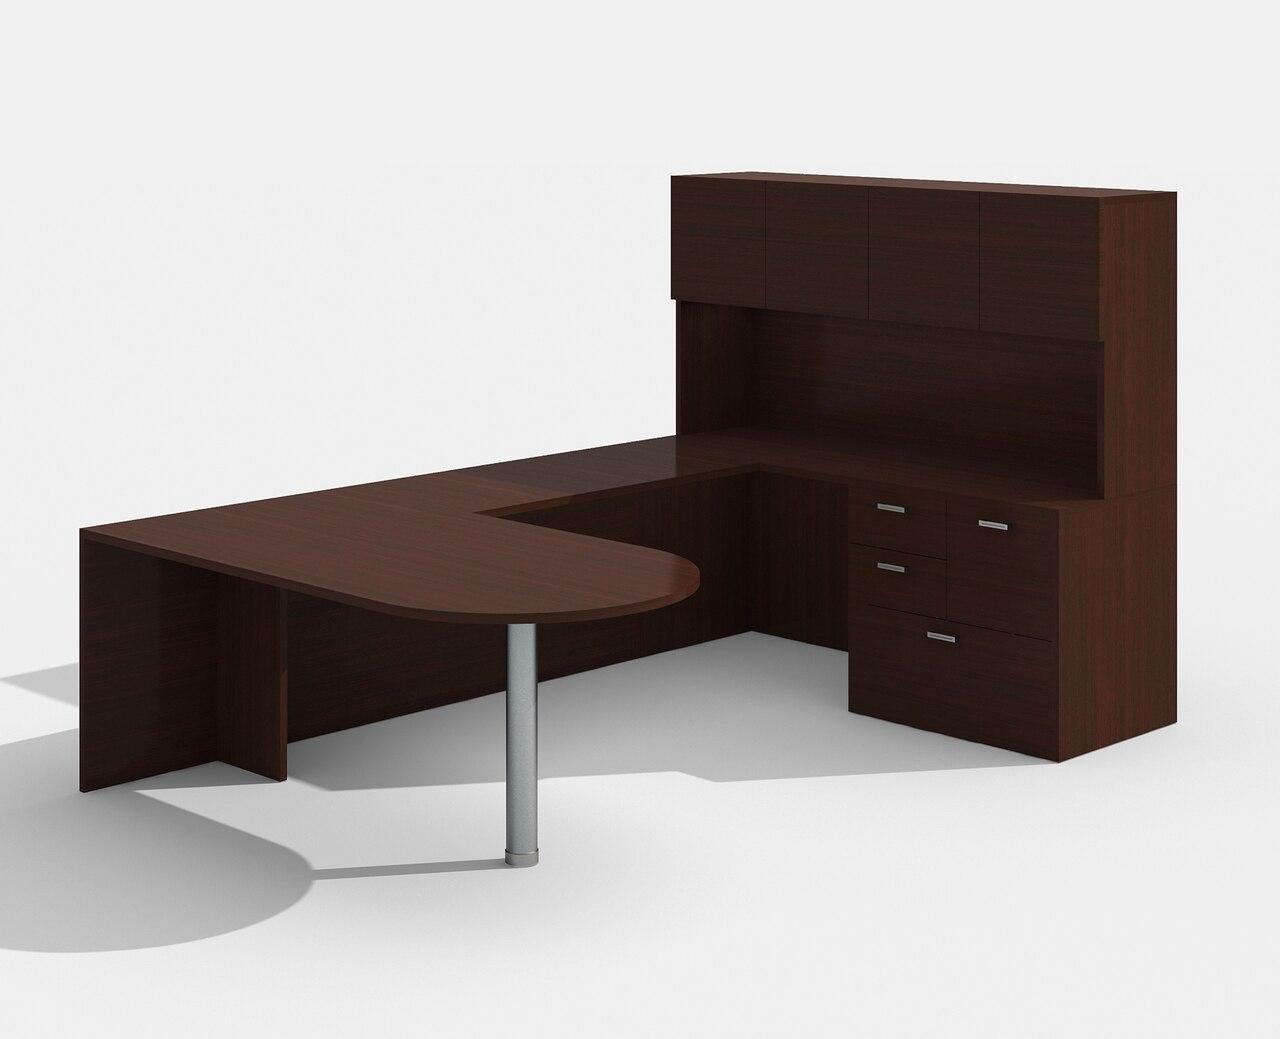 mahogany am-364n amber bullet shape u desk with hutch